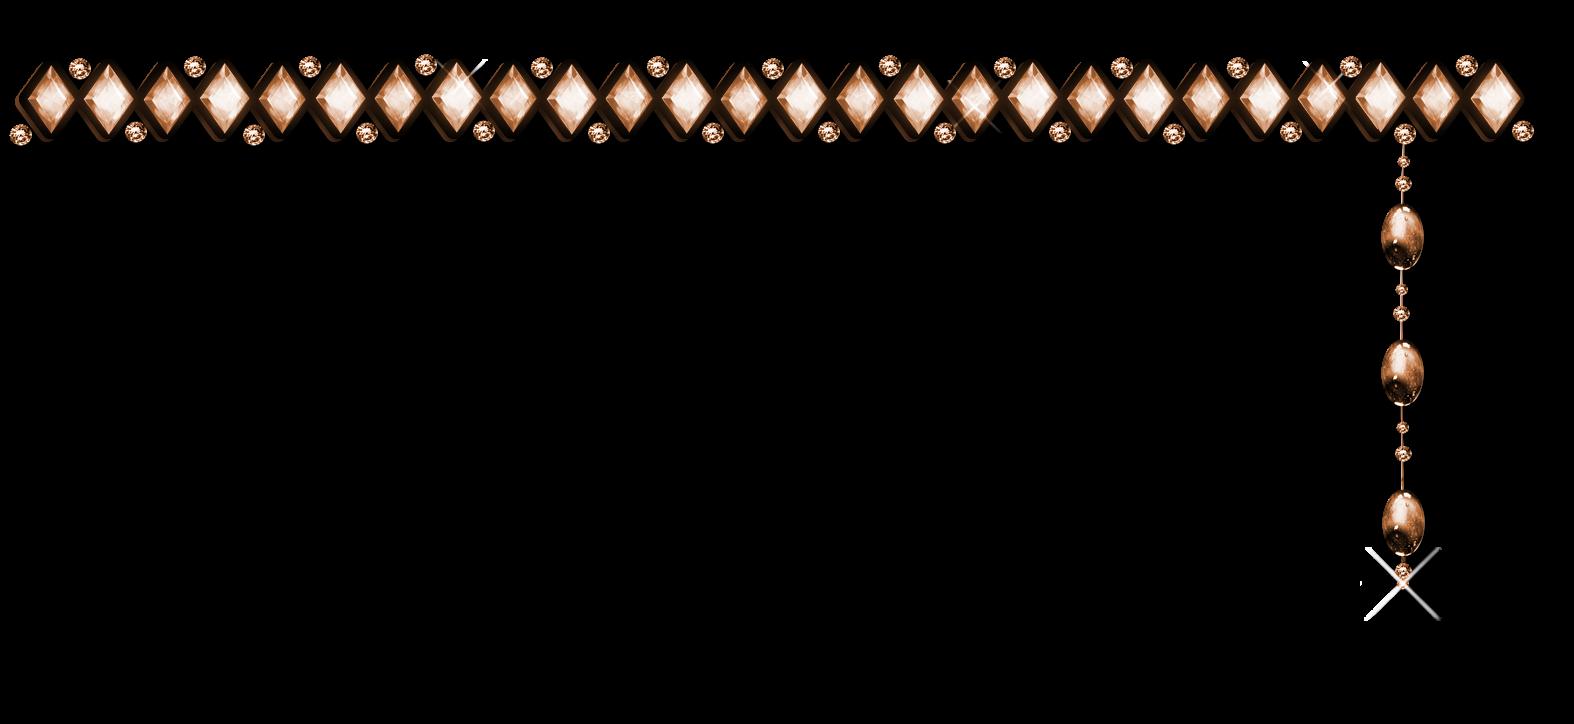 Jewel clipart daimond. Diamond border design google